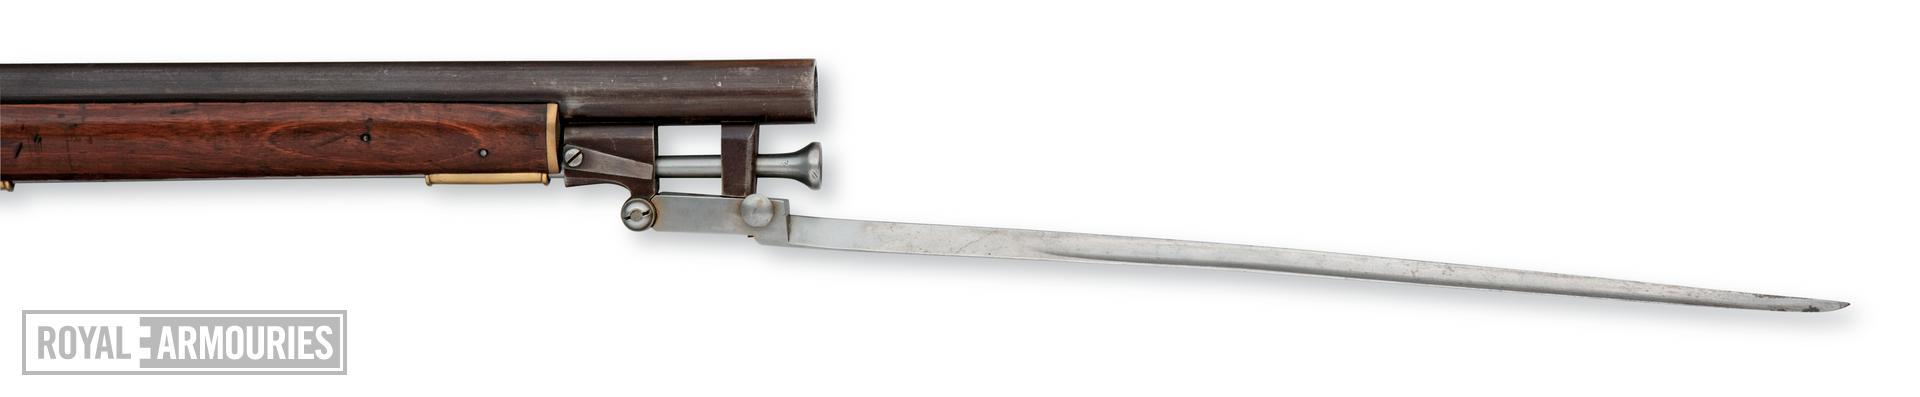 Percussion muzzle-loading carbine For constabulary